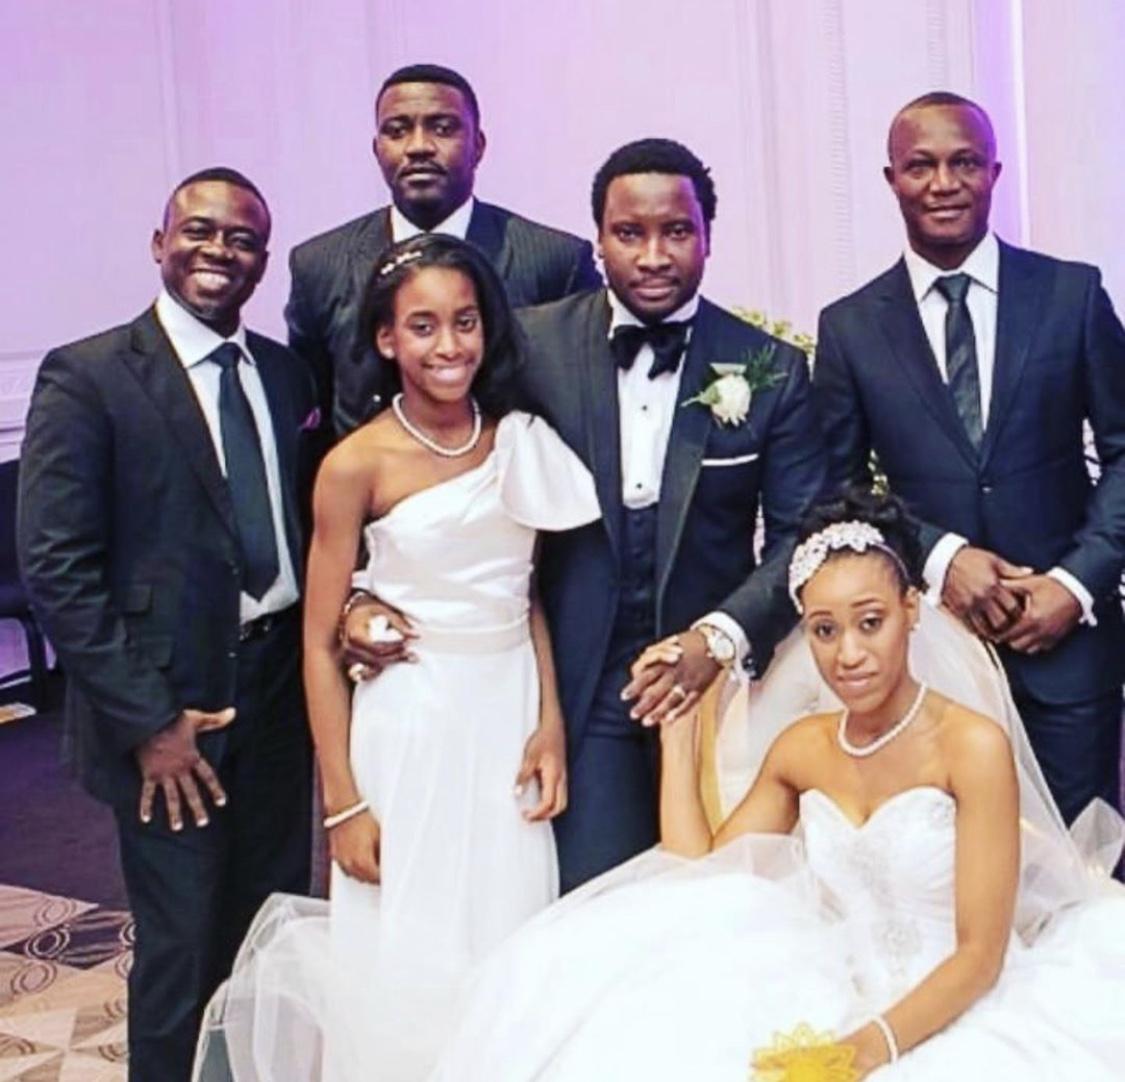 sonnie-badu-celebrates-6th-wedding-anniversary-with-a-major-throwback